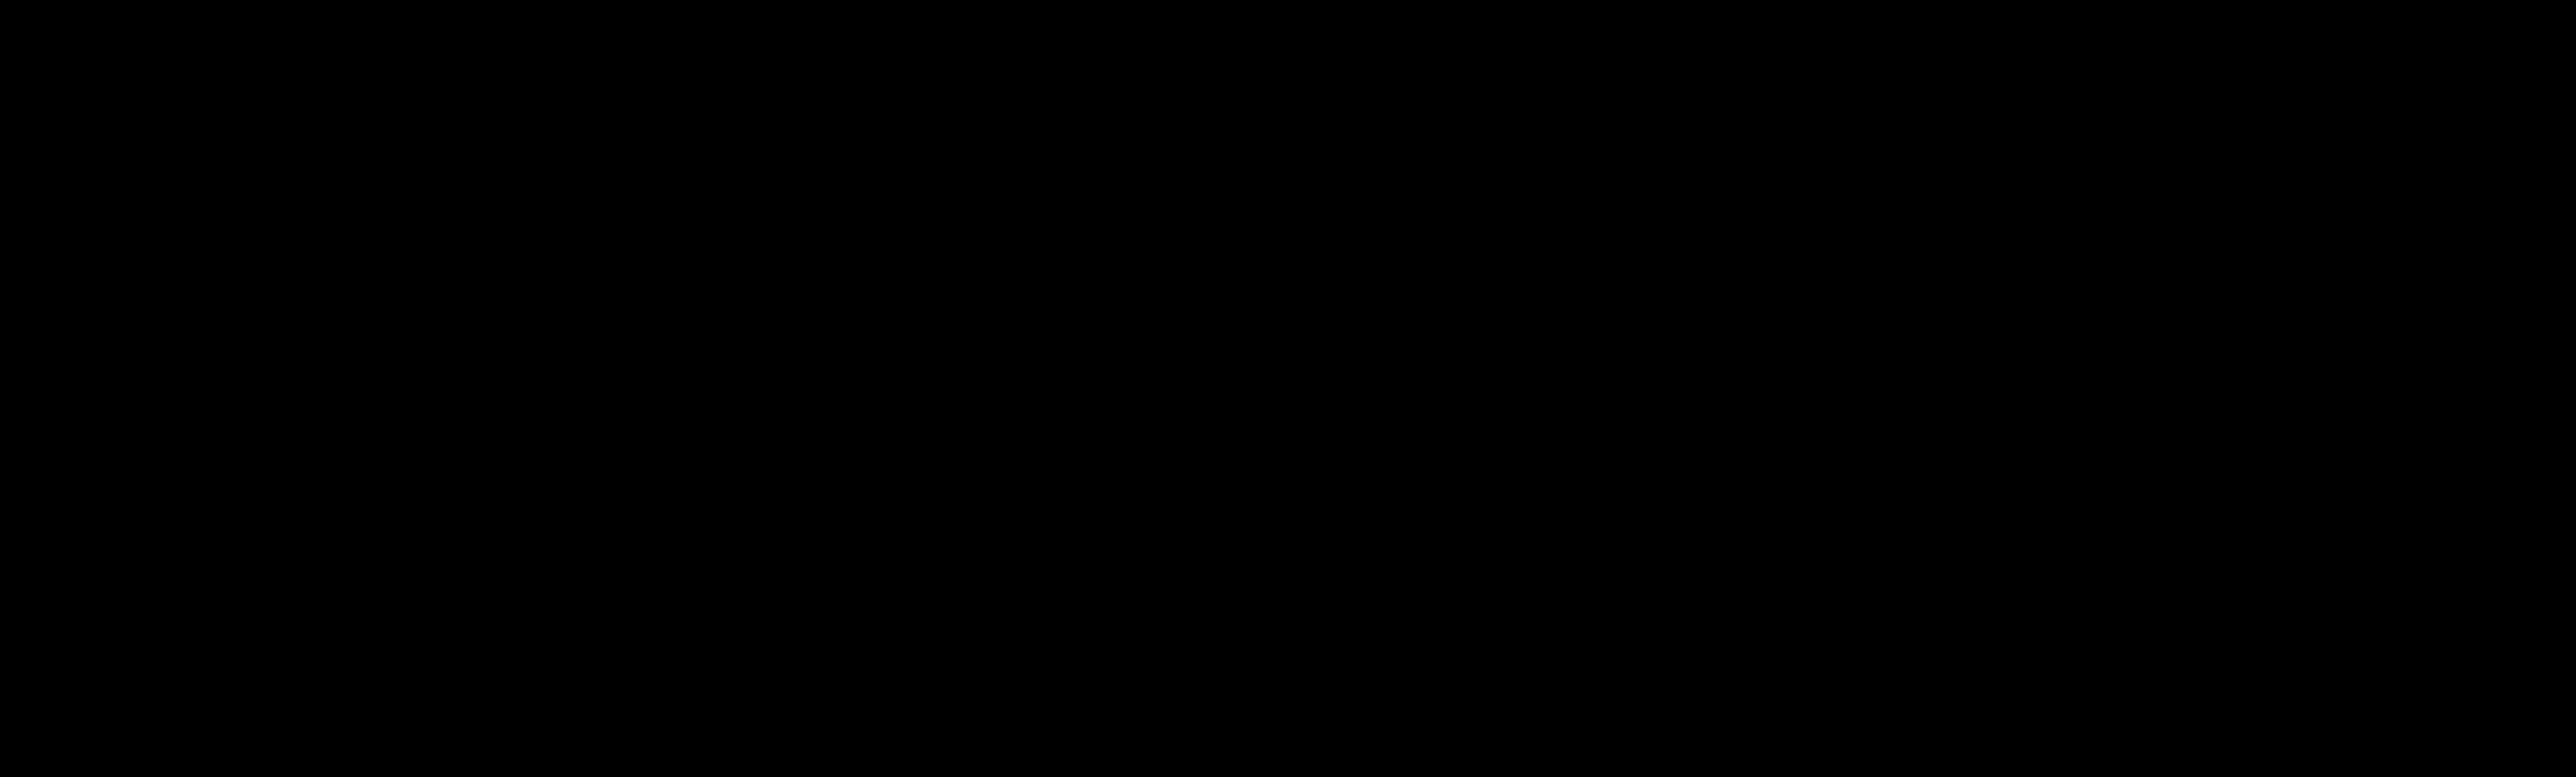 N-Feruloyl serotonin-mono-β-D- glucopyranoside